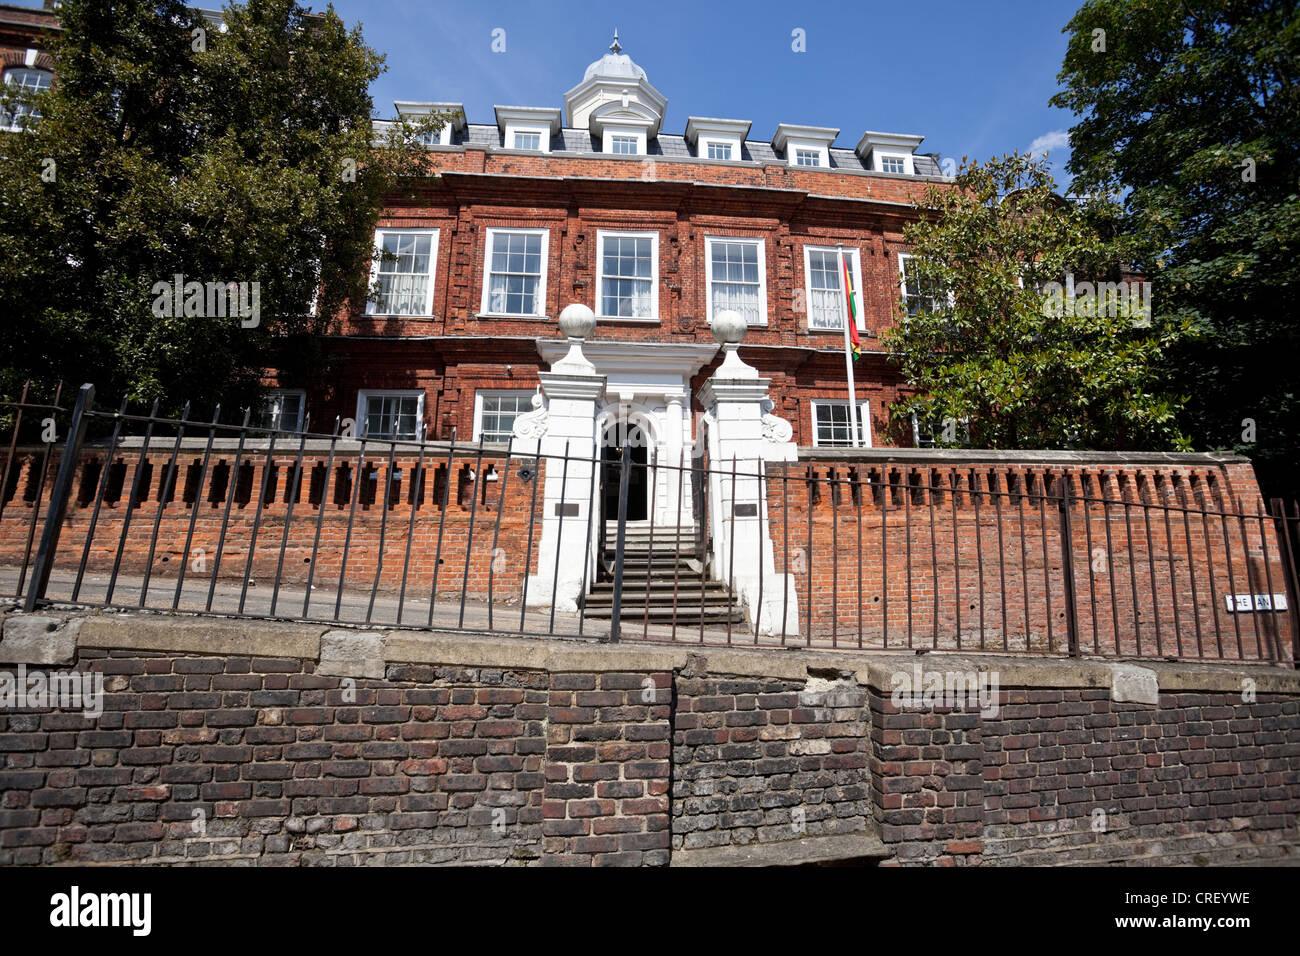 Cromwell House, Ghana High Commission, The Bank, Highgate Hill, N6, London, England, UK - Stock Image